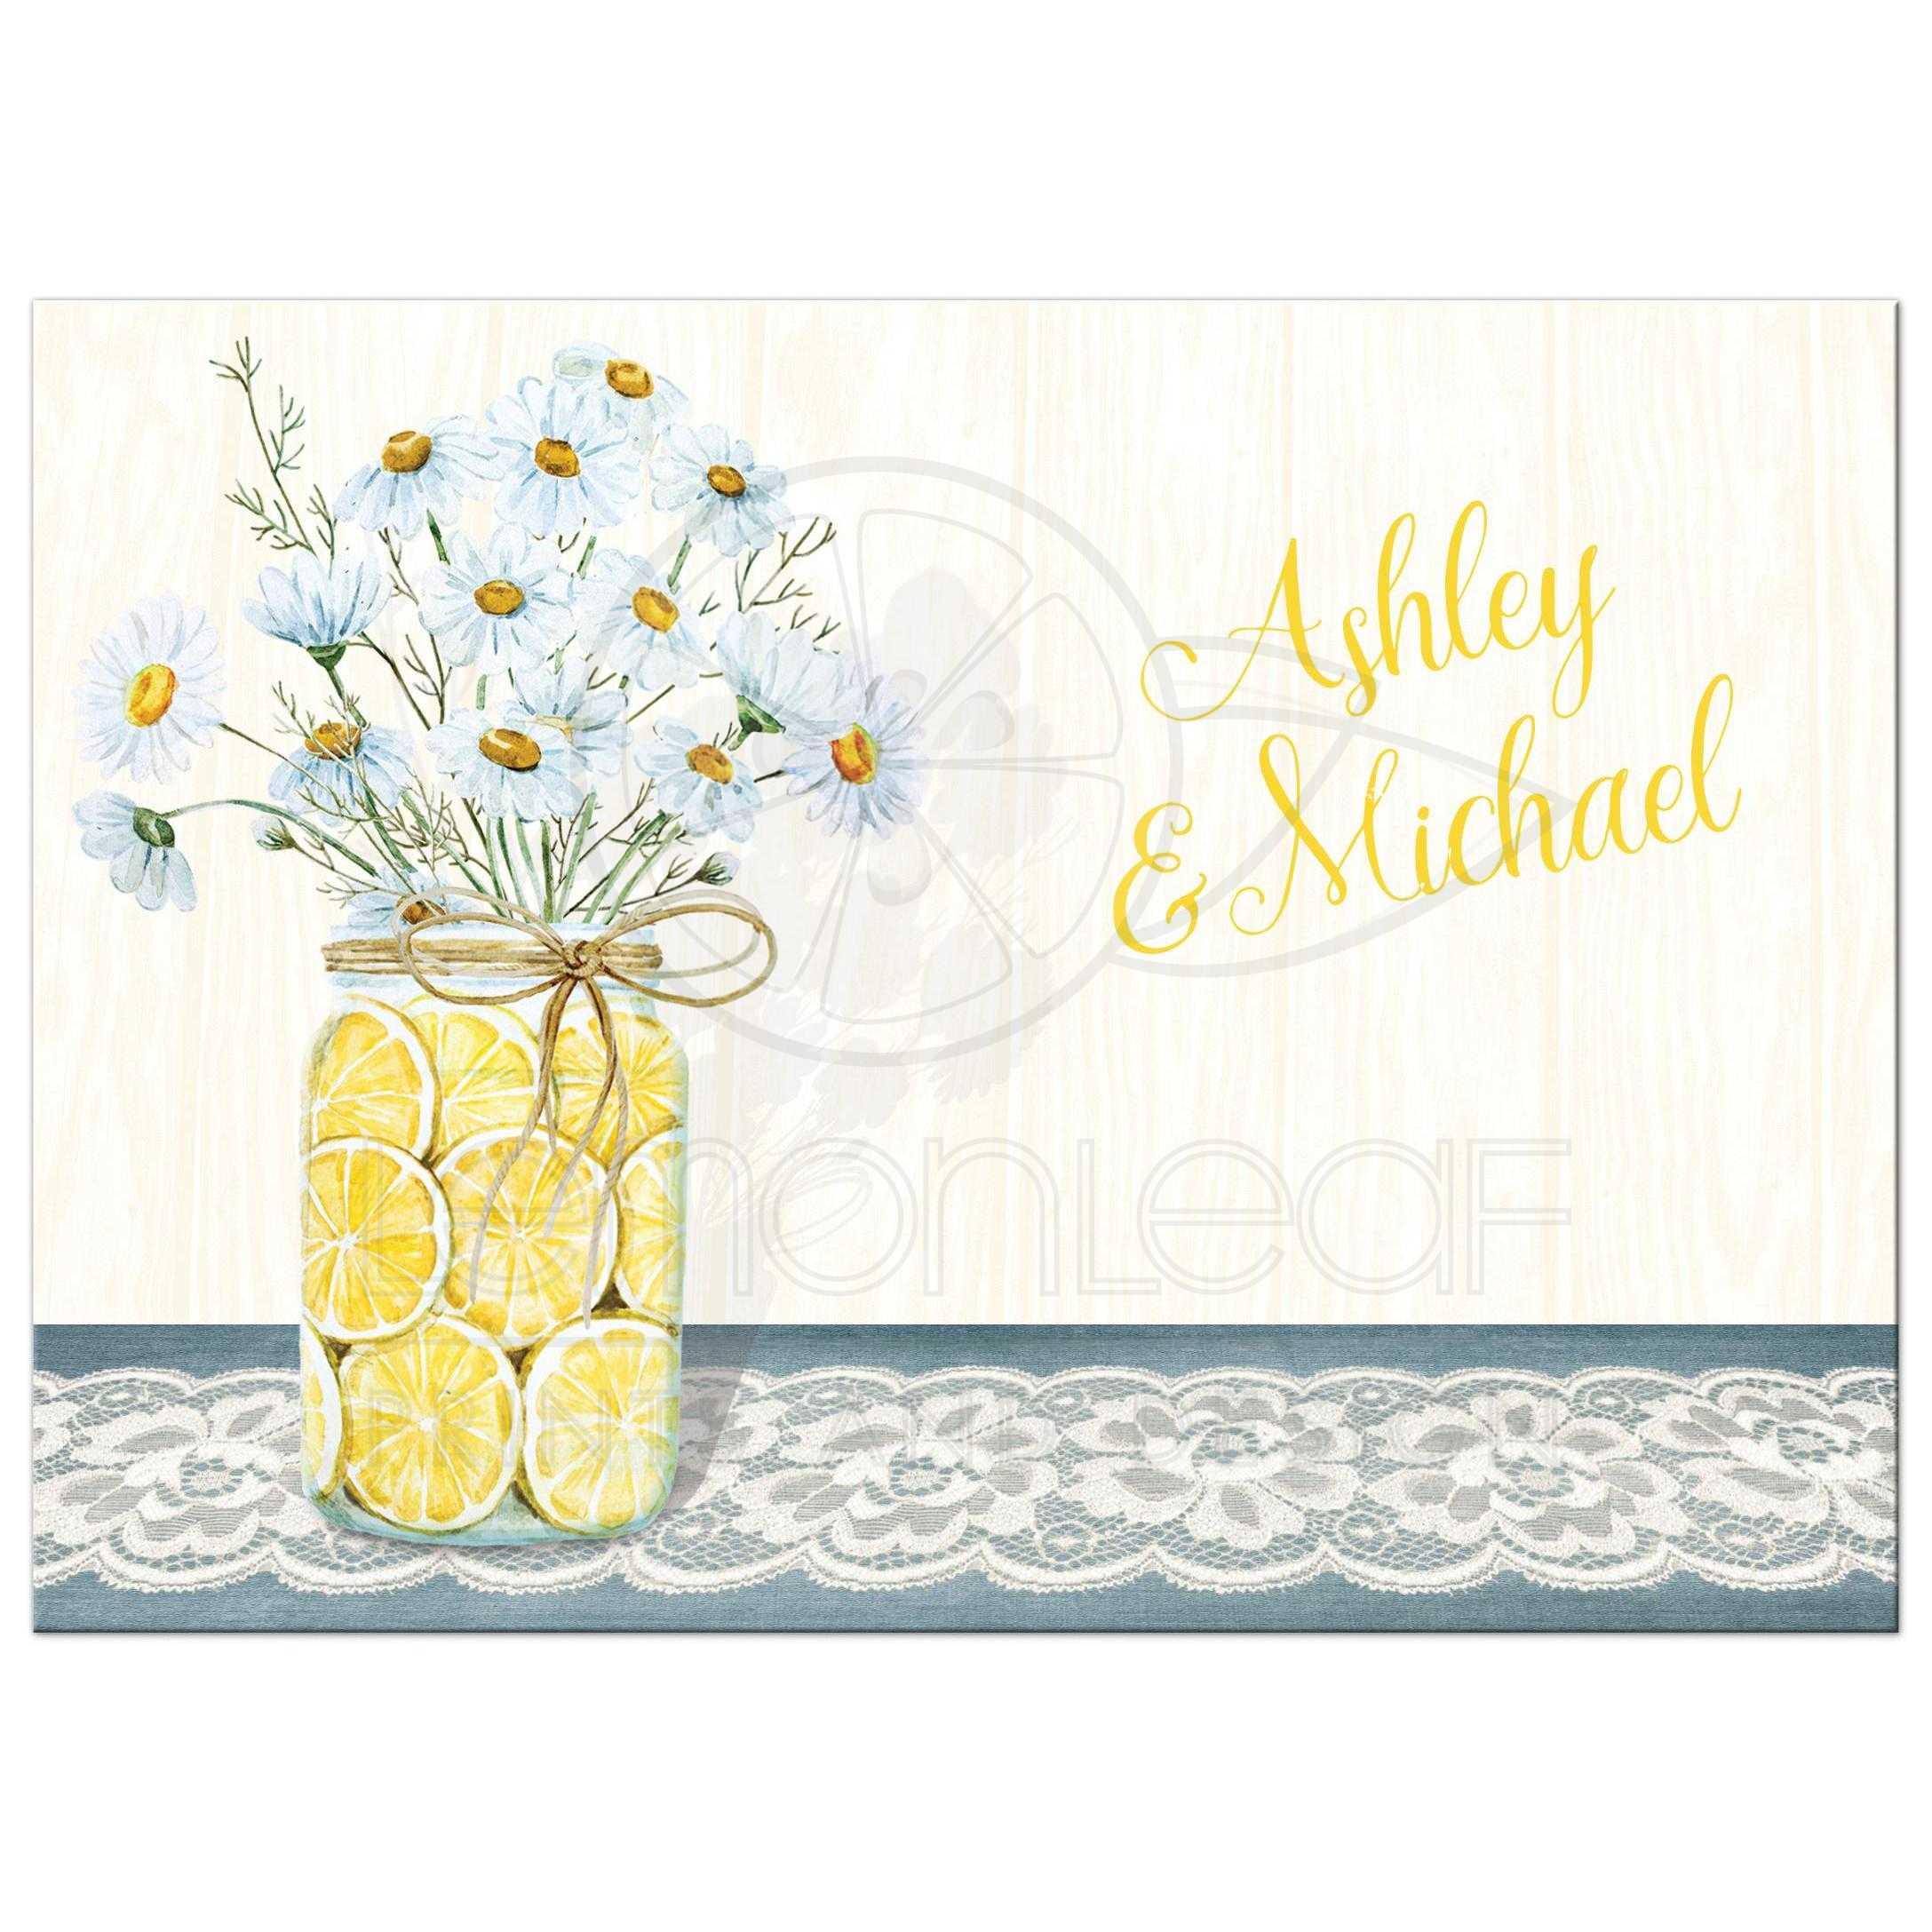 rustic wedding invitations with mason jars mason jar wedding invitations yellow blue white daisies lace denim lemons wood grain and superb mason jar wedding invitations